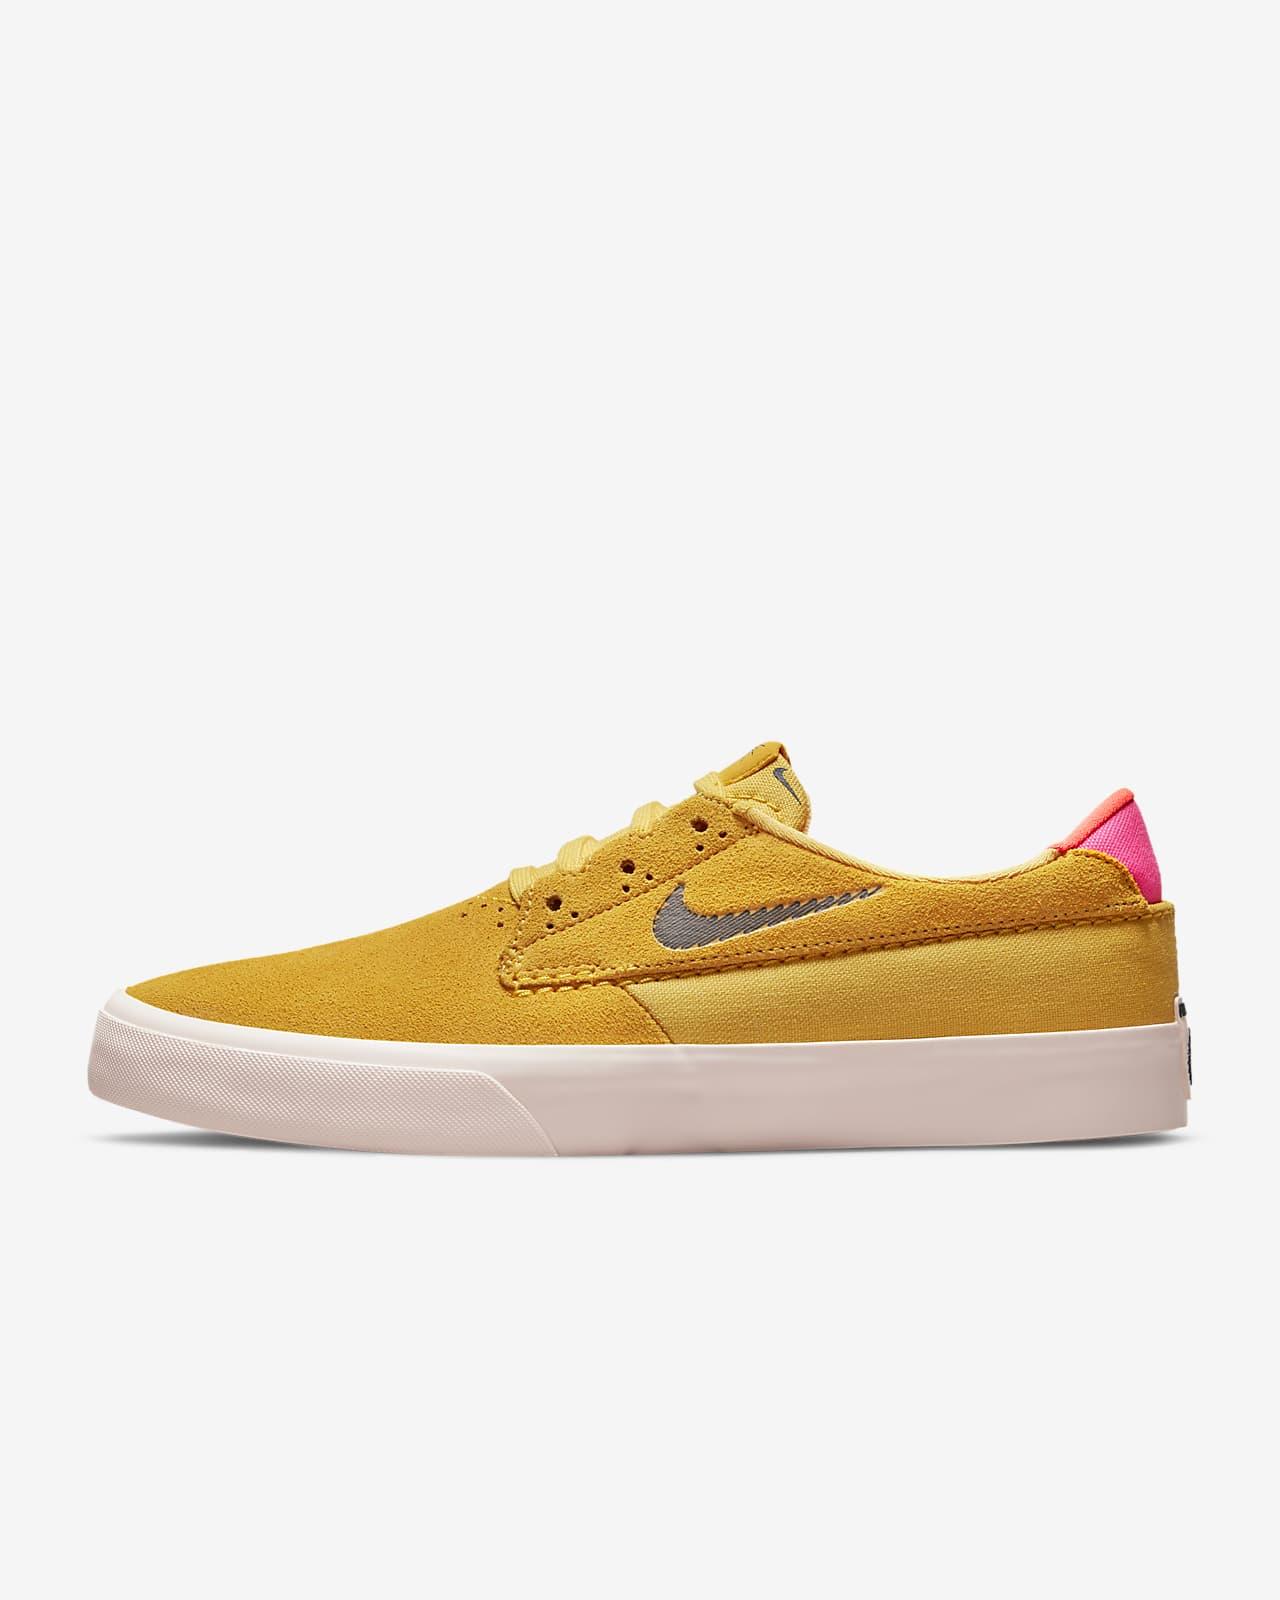 Chaussure de skateboard Nike SB Shane T. Nike LU